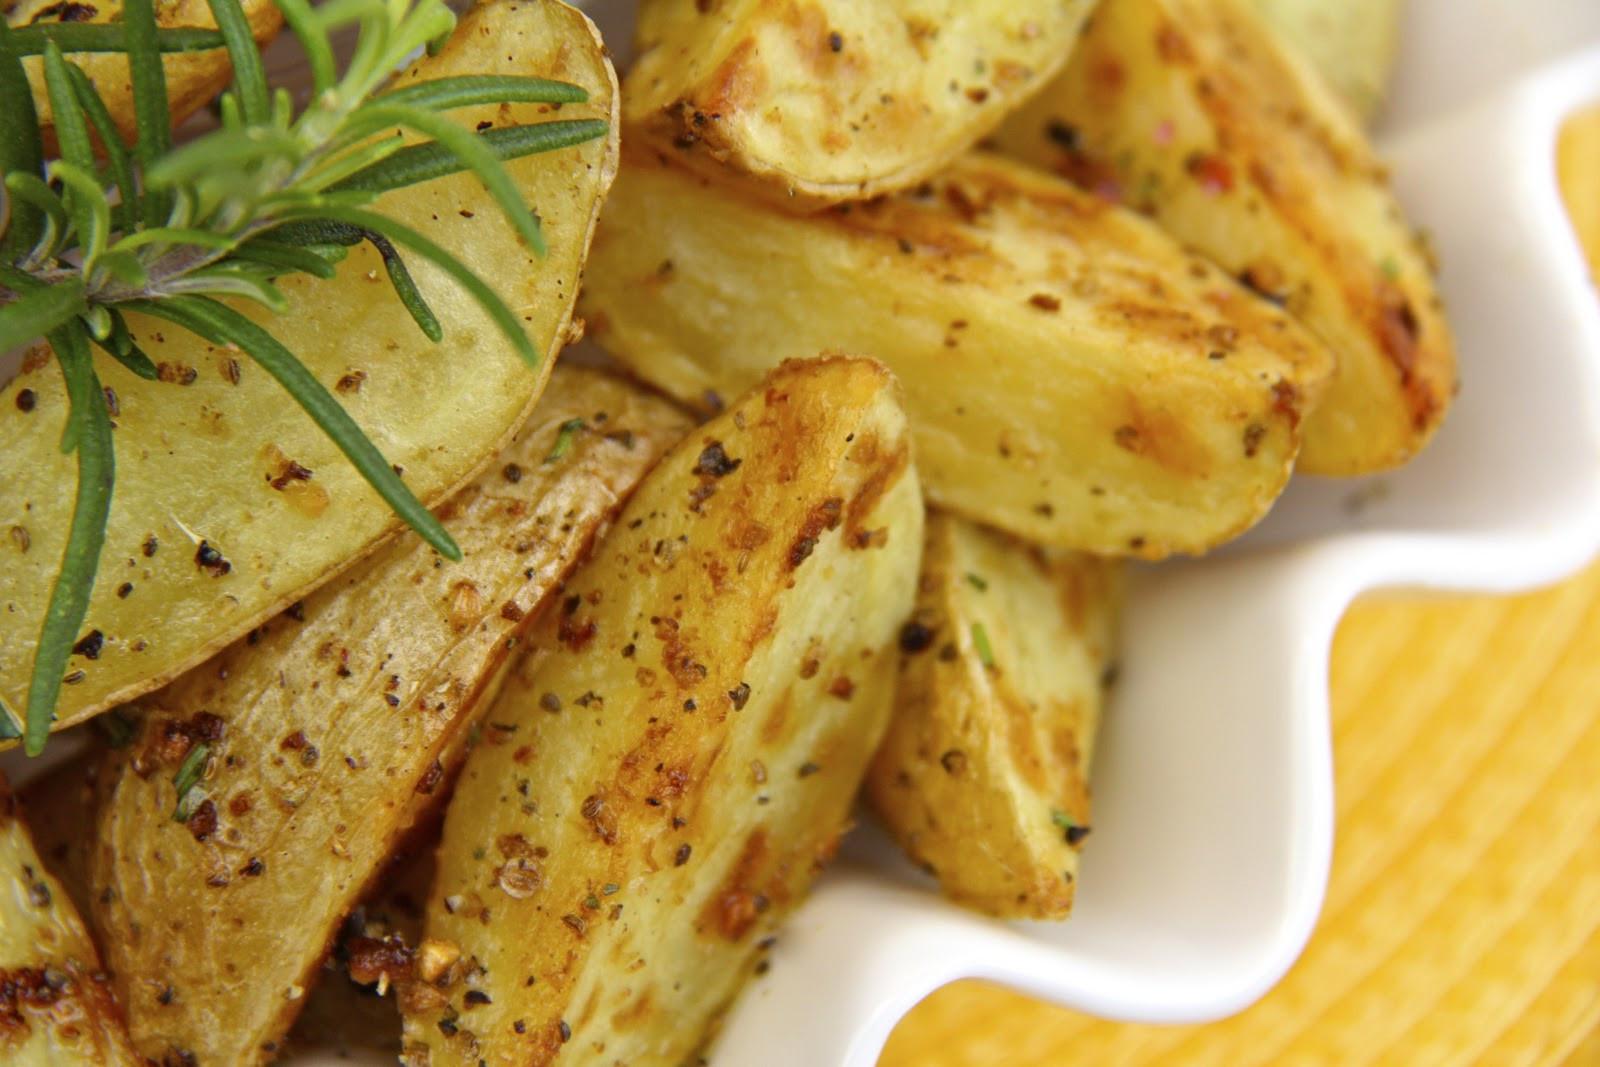 Oven Roasted Baby Potatoes  Super Crisp Oven Roasted Baby Potatoes w Fresh Rosemary